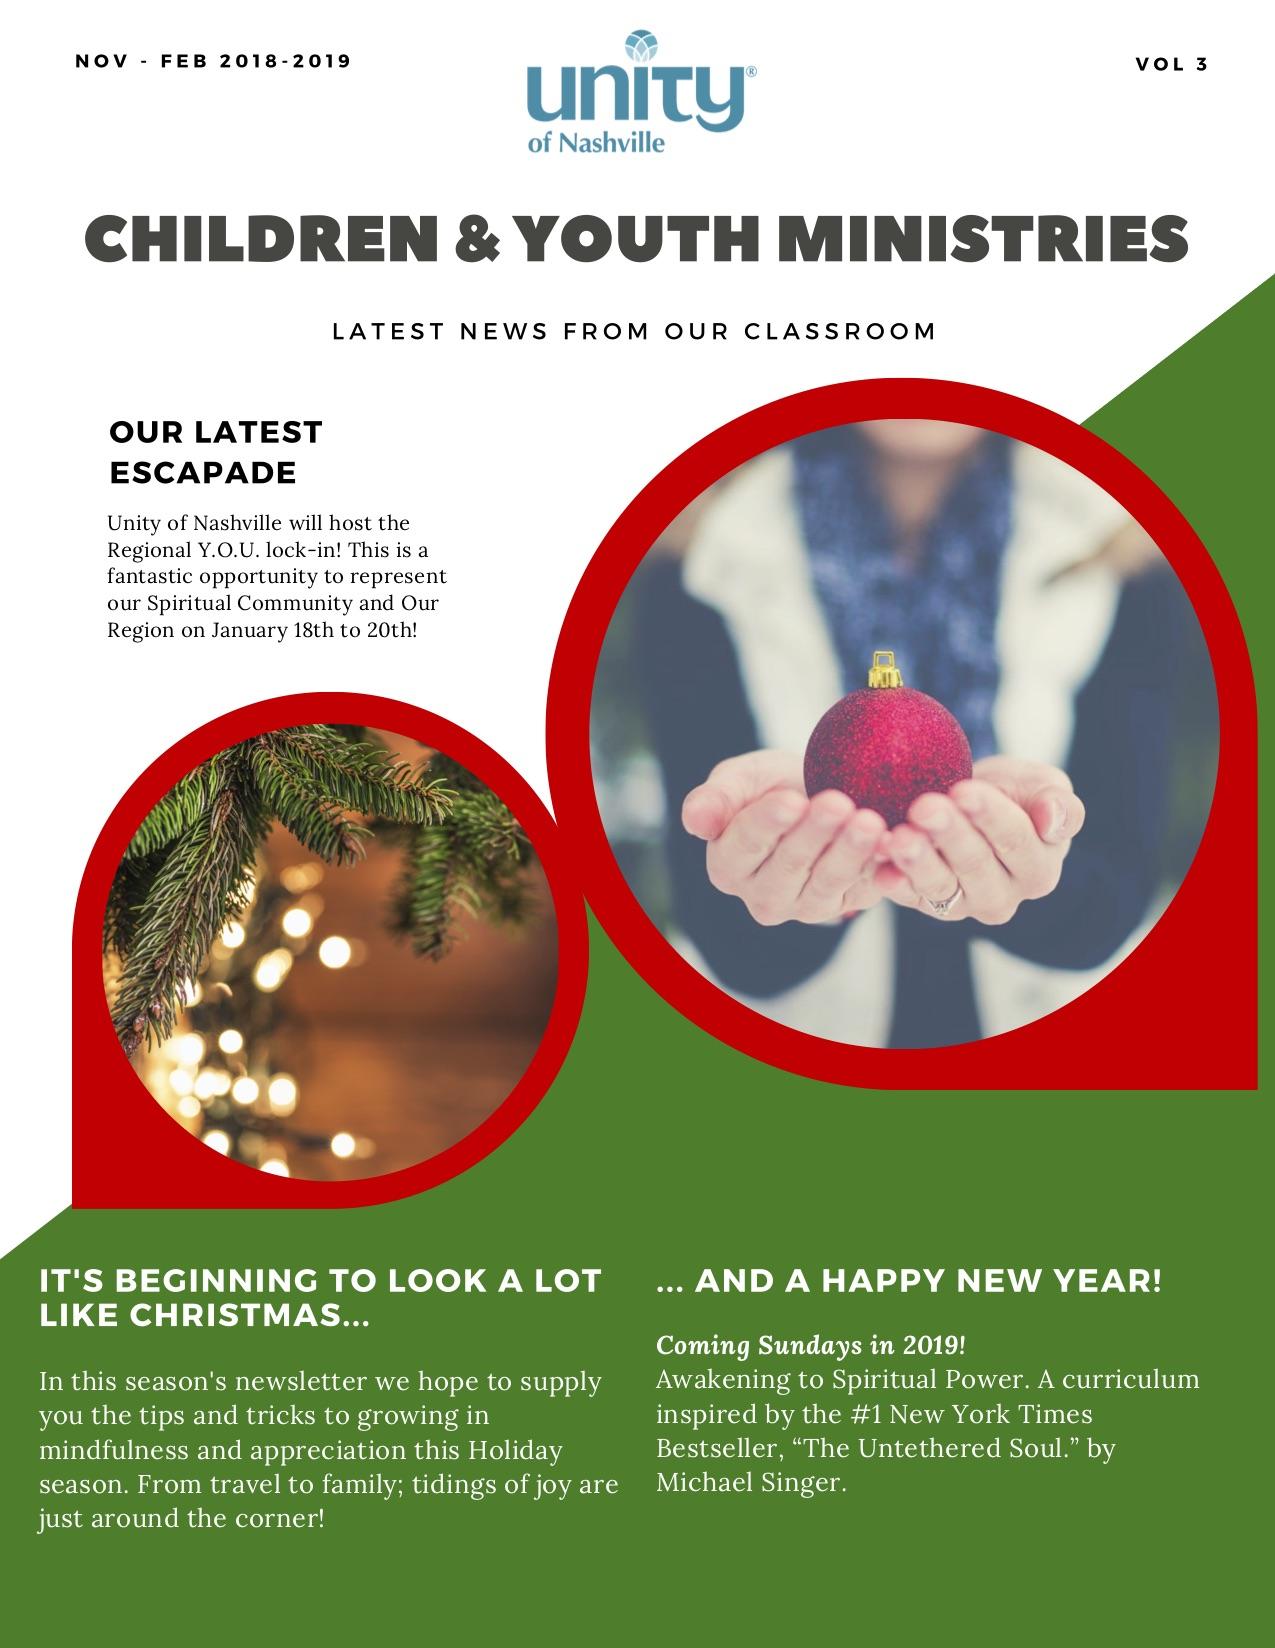 Youth newsletter Nov-Feb 2018%2F19 (4)_1.jpg